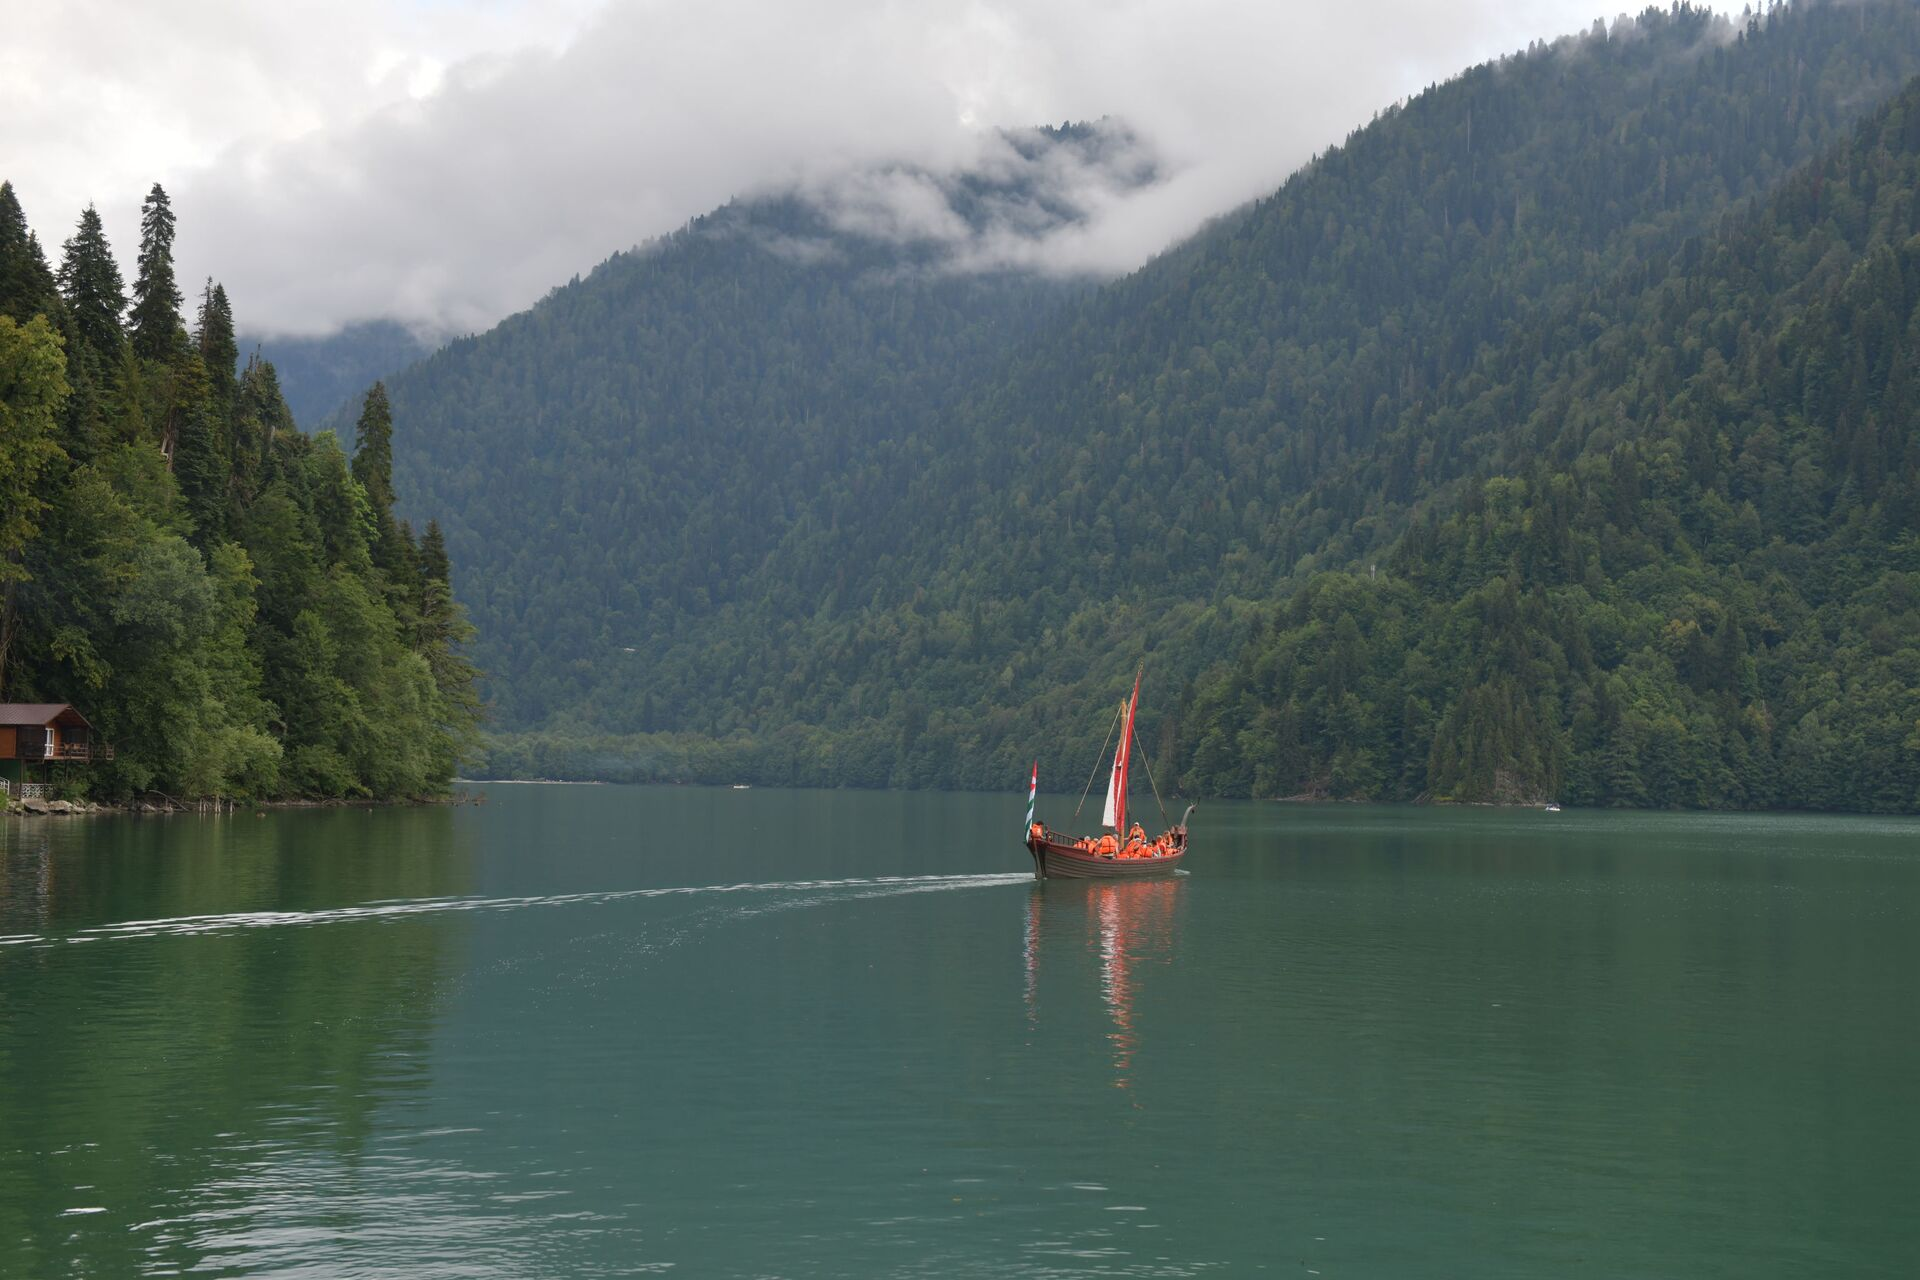 Спуск на воду галеры на озере Рица - Sputnik Абхазия, 1920, 12.10.2021